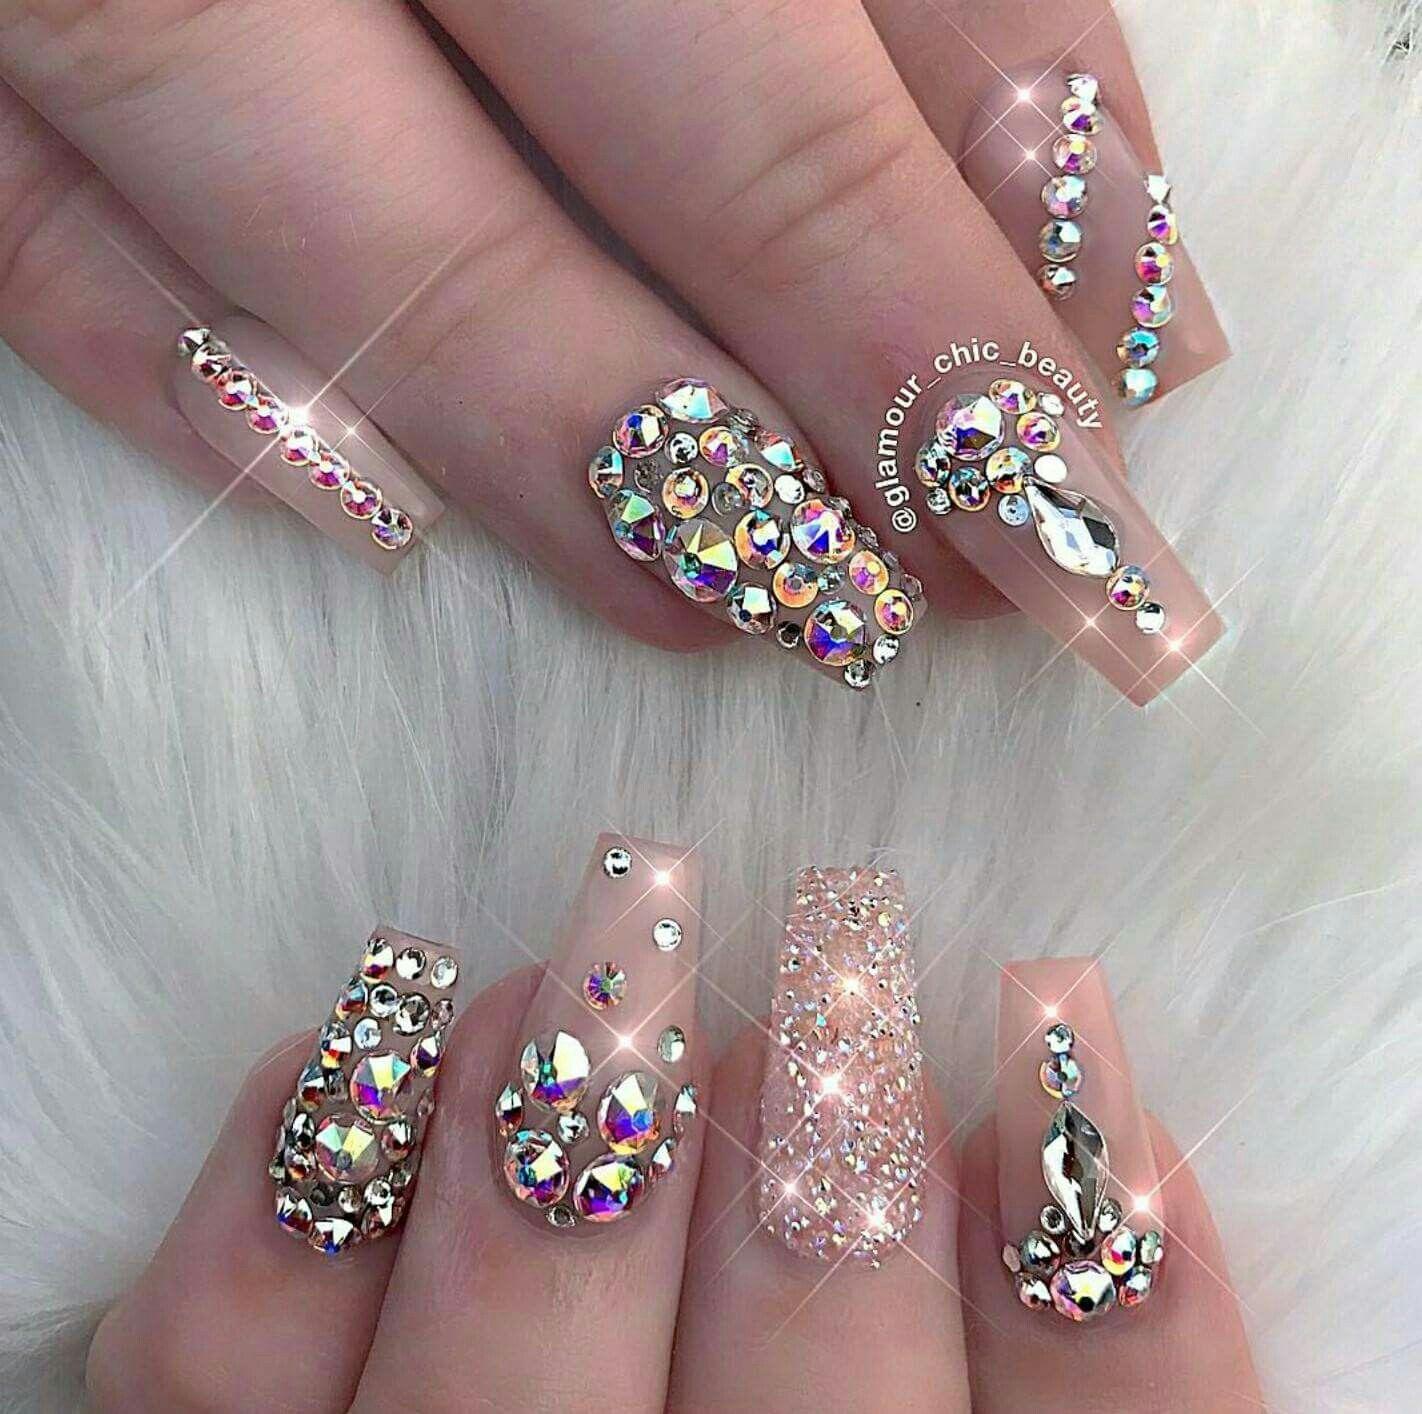 Pin de Christina Reyna en Nails | Pinterest | Unas acrilicas ...